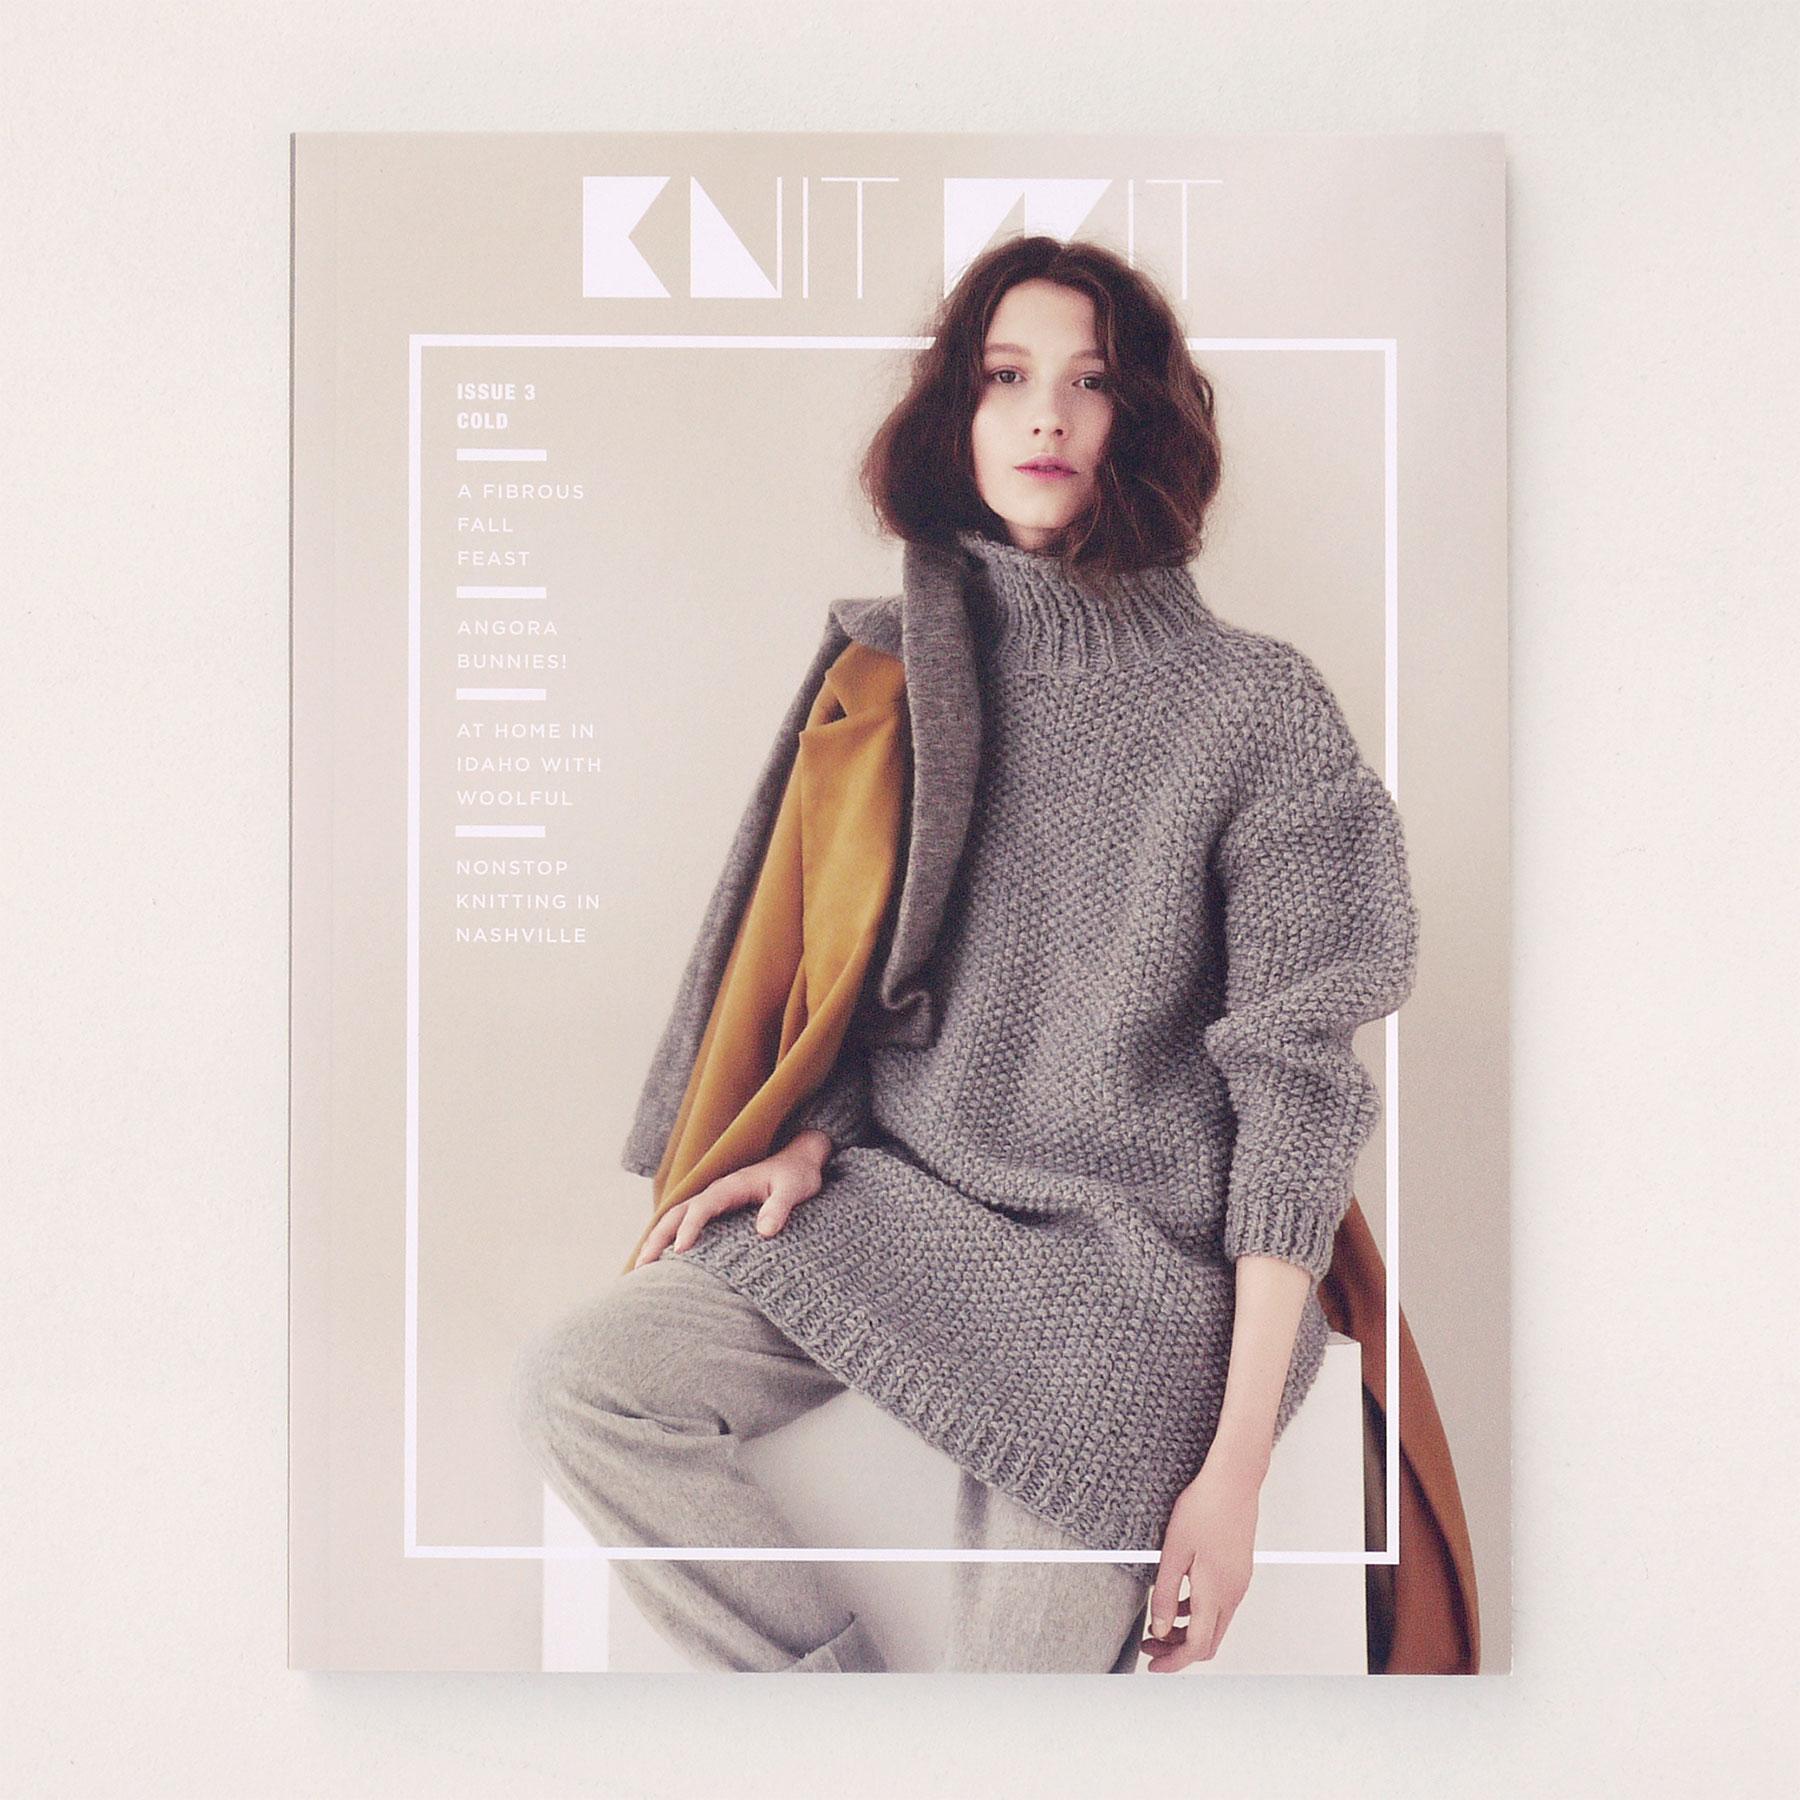 Knit Wit Magazine – Issue 3